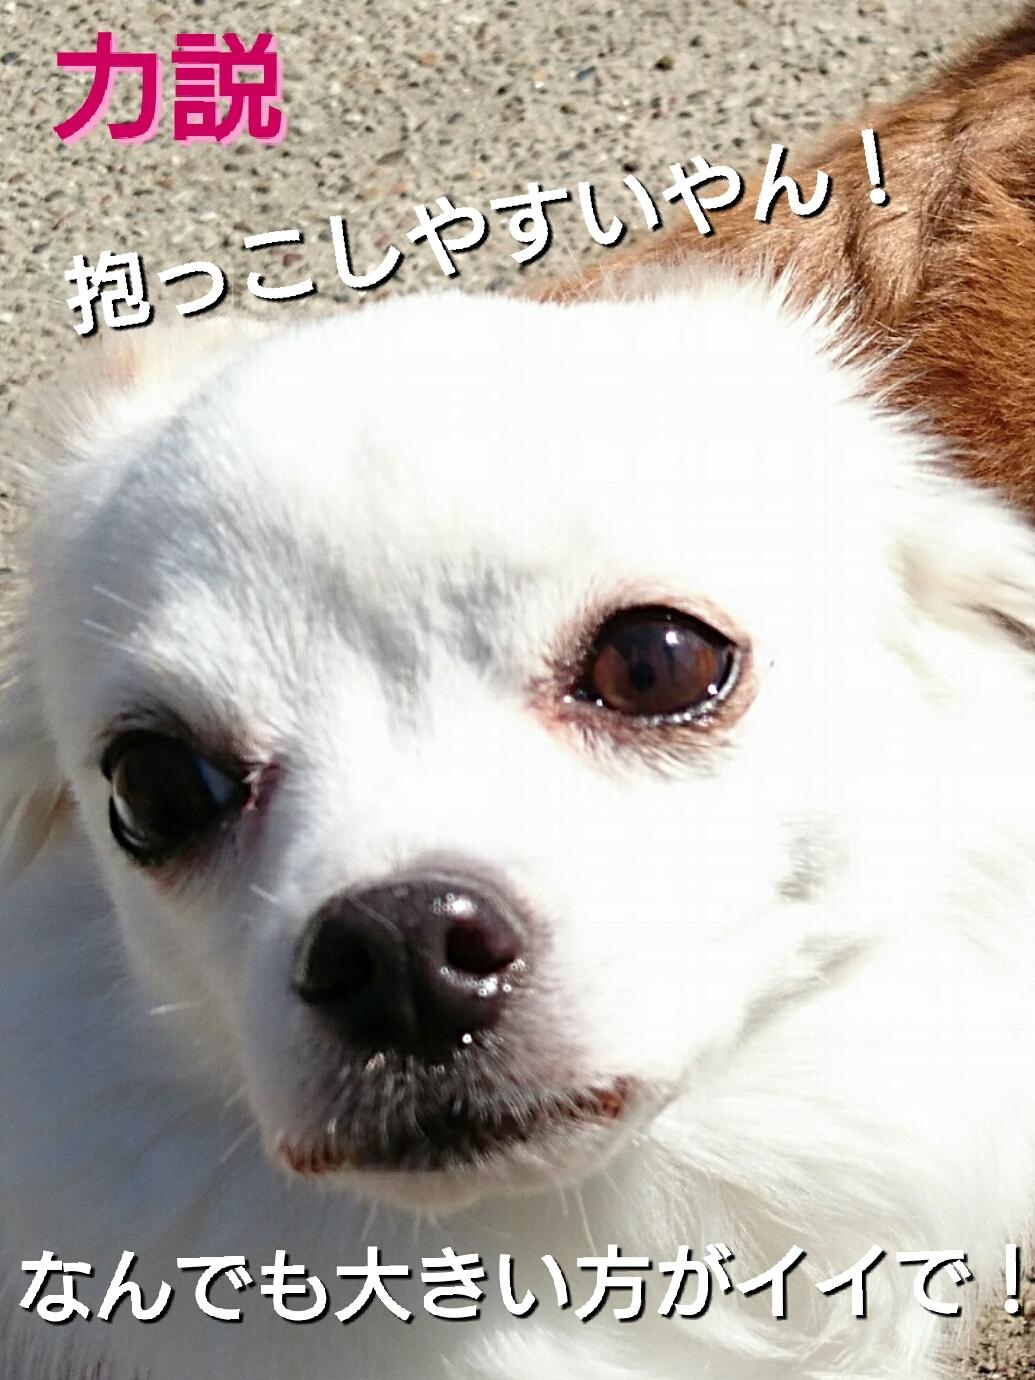 201701111149273e4.jpg